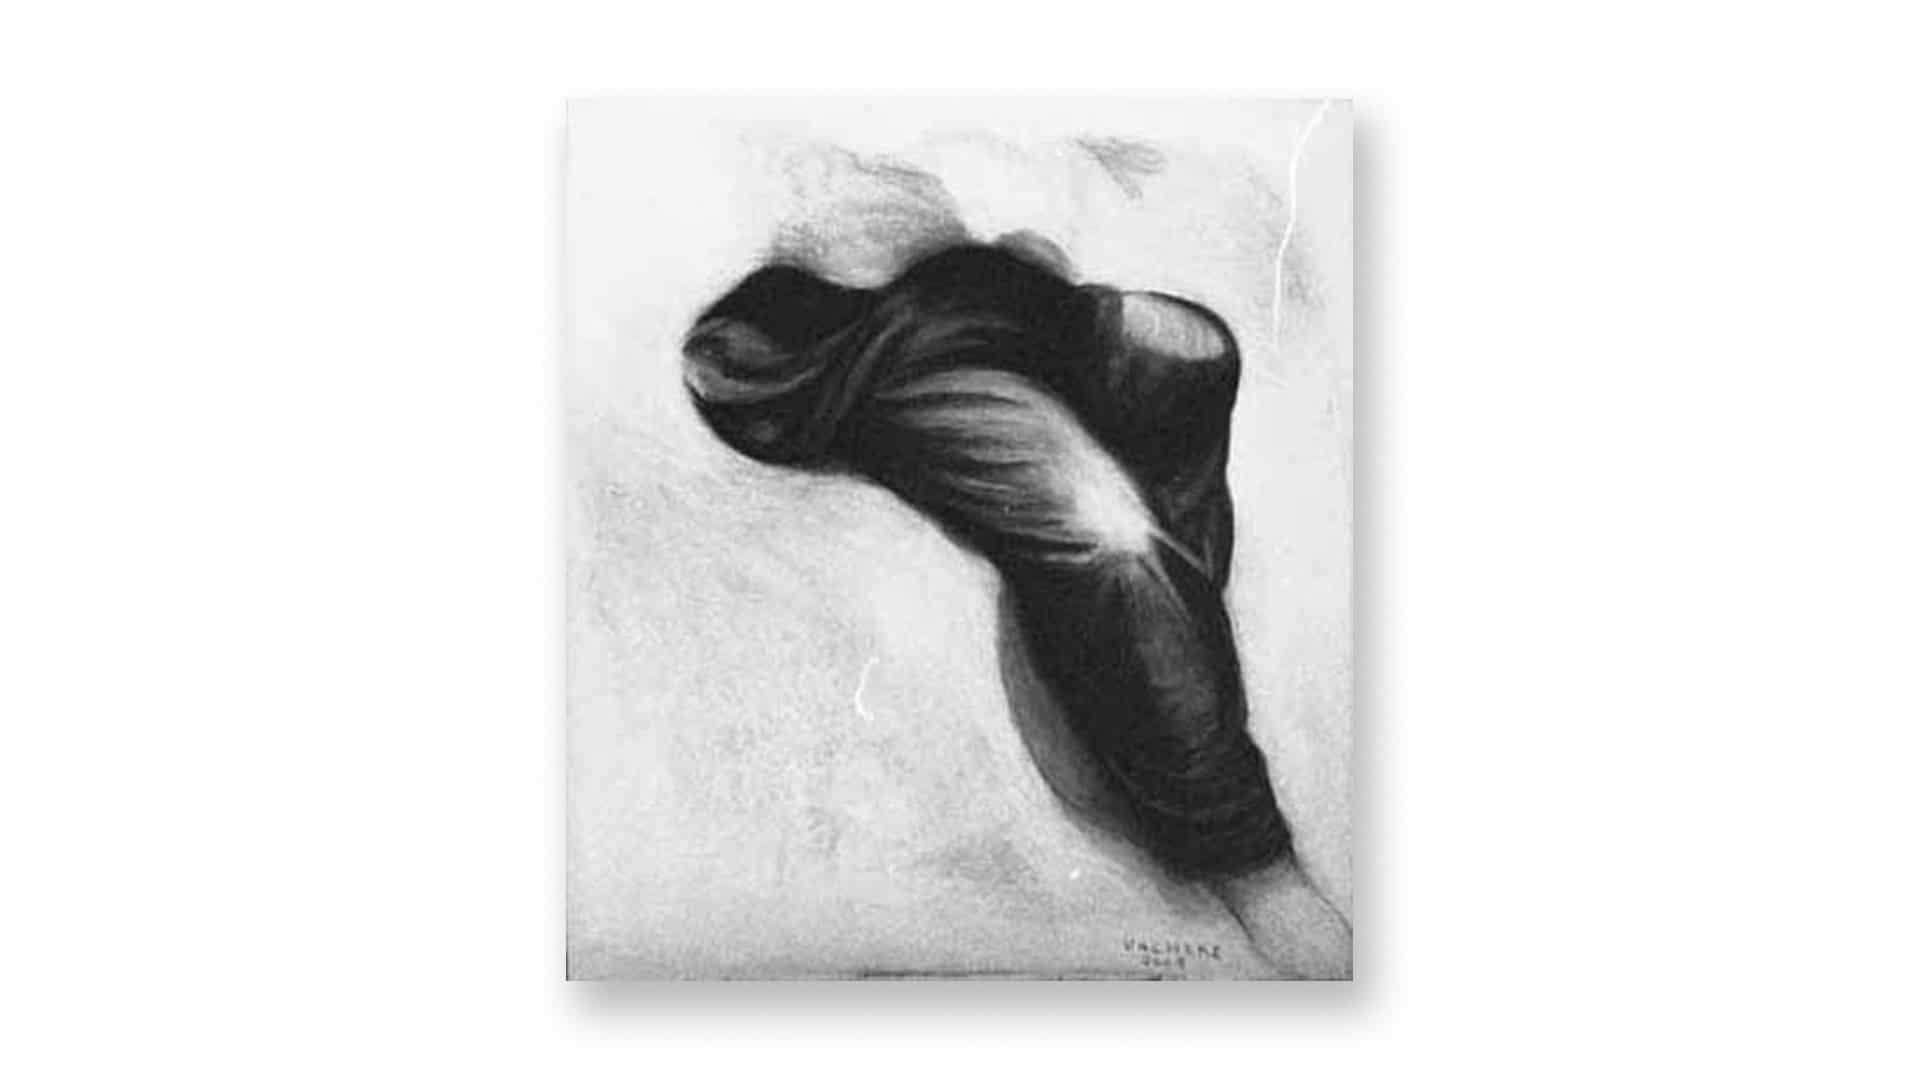 dibujos-galeria-atxeden-pachere-Dibujo-08